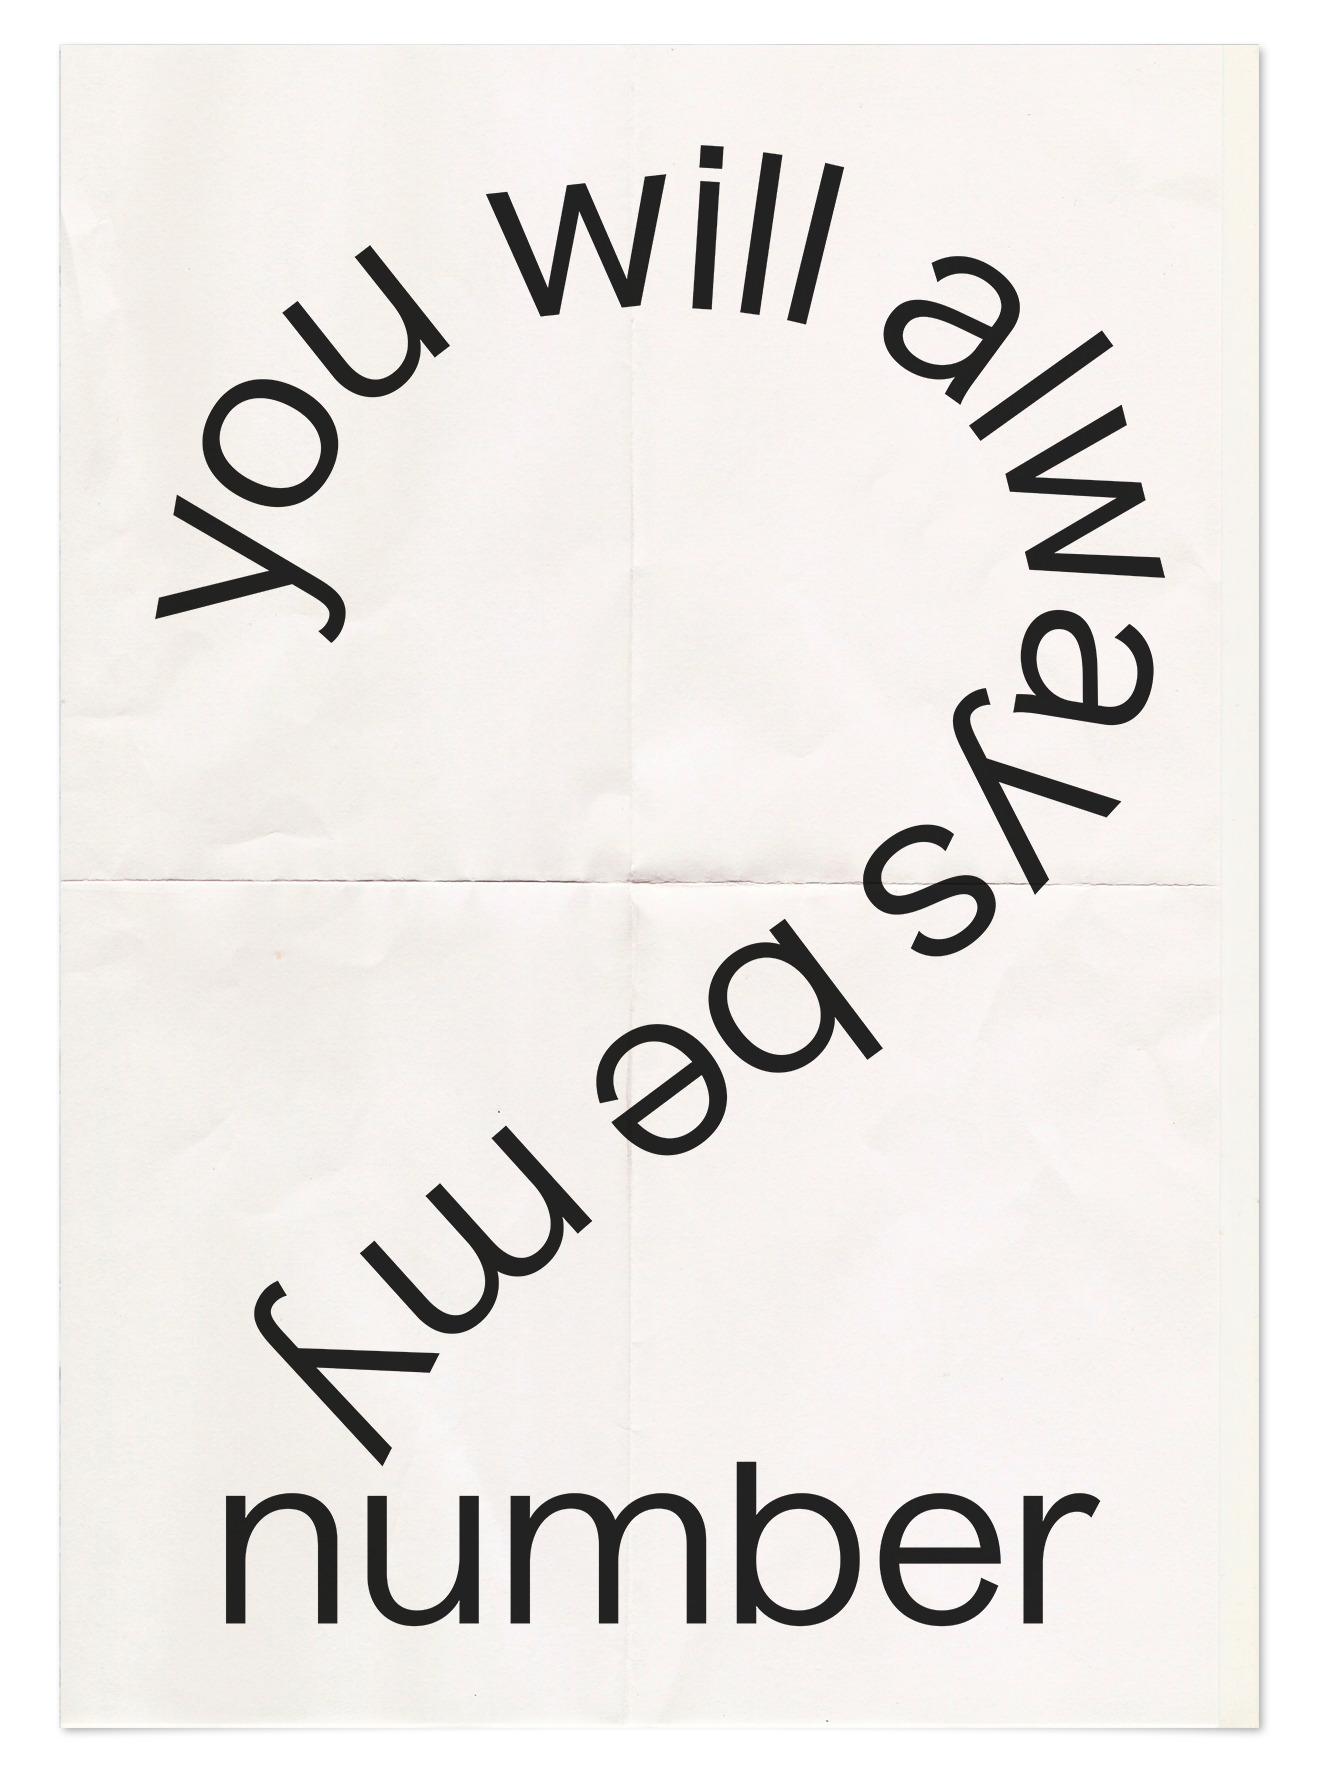 Number 2 3 6 39.4 × 27.6 (100 7 - brunorodrigues | ello